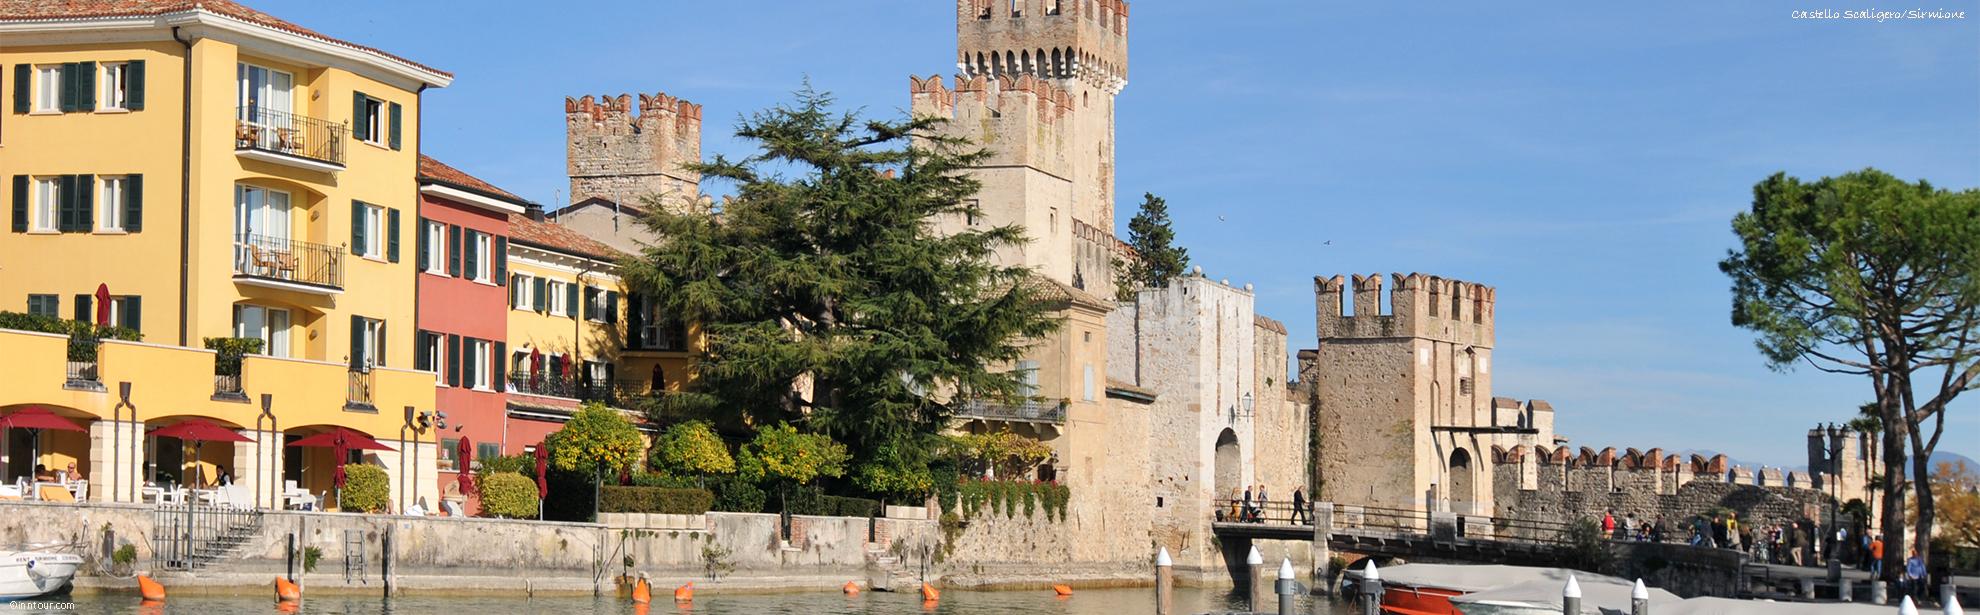 Osportinntour_Castello-Scaligero_Sirmione_DSC_1090